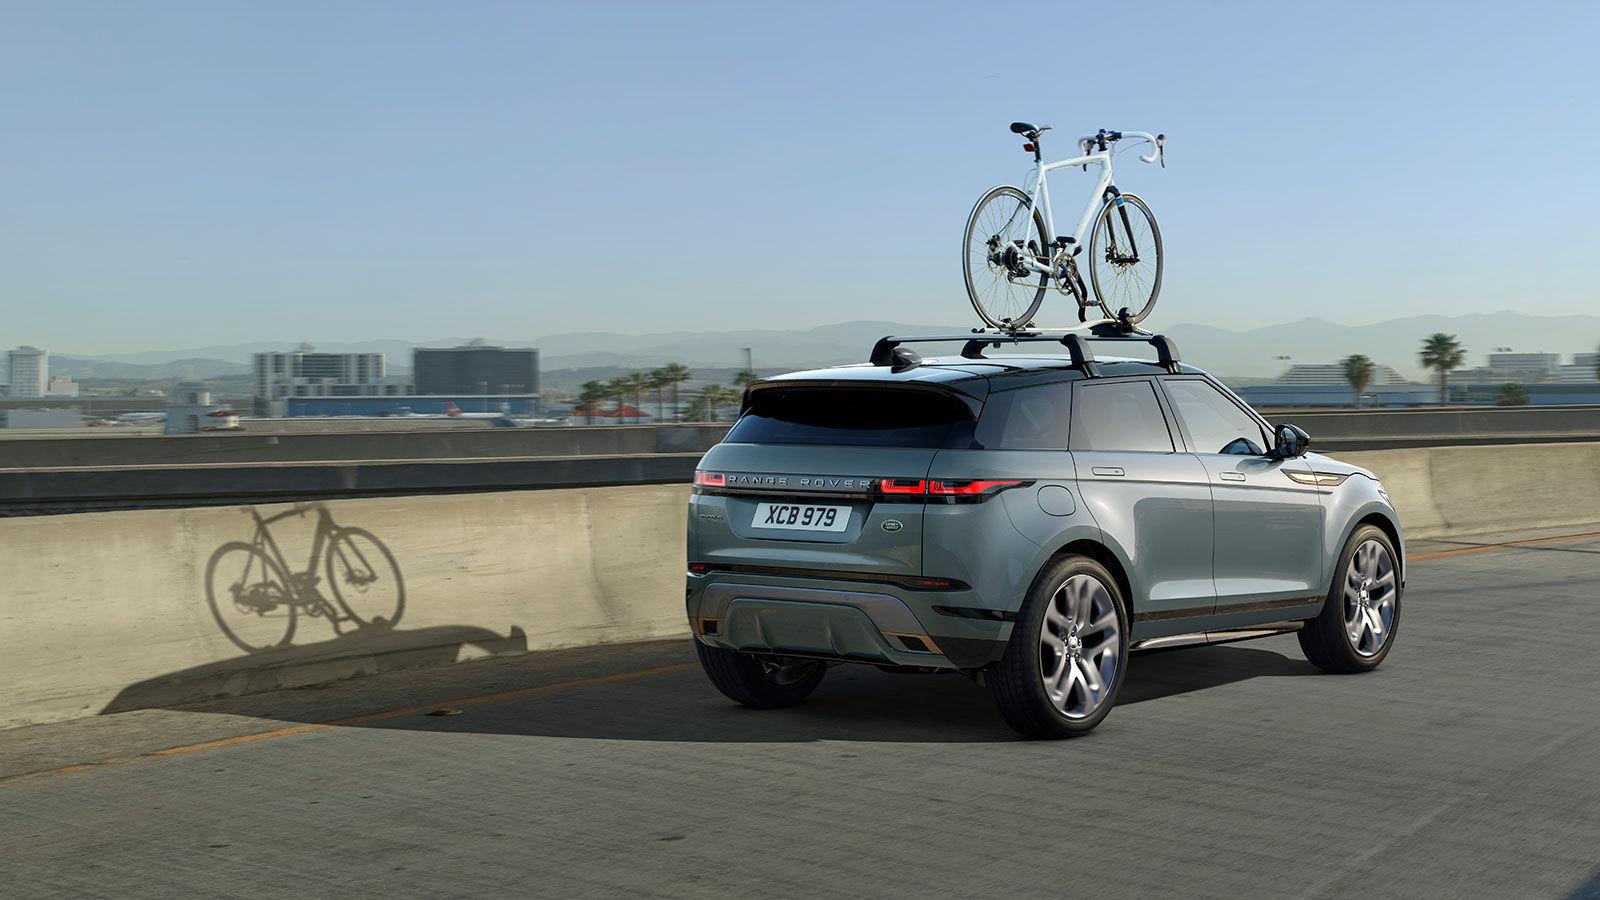 New Range Rover Evoque - Compact SUV | Land Rover UAE